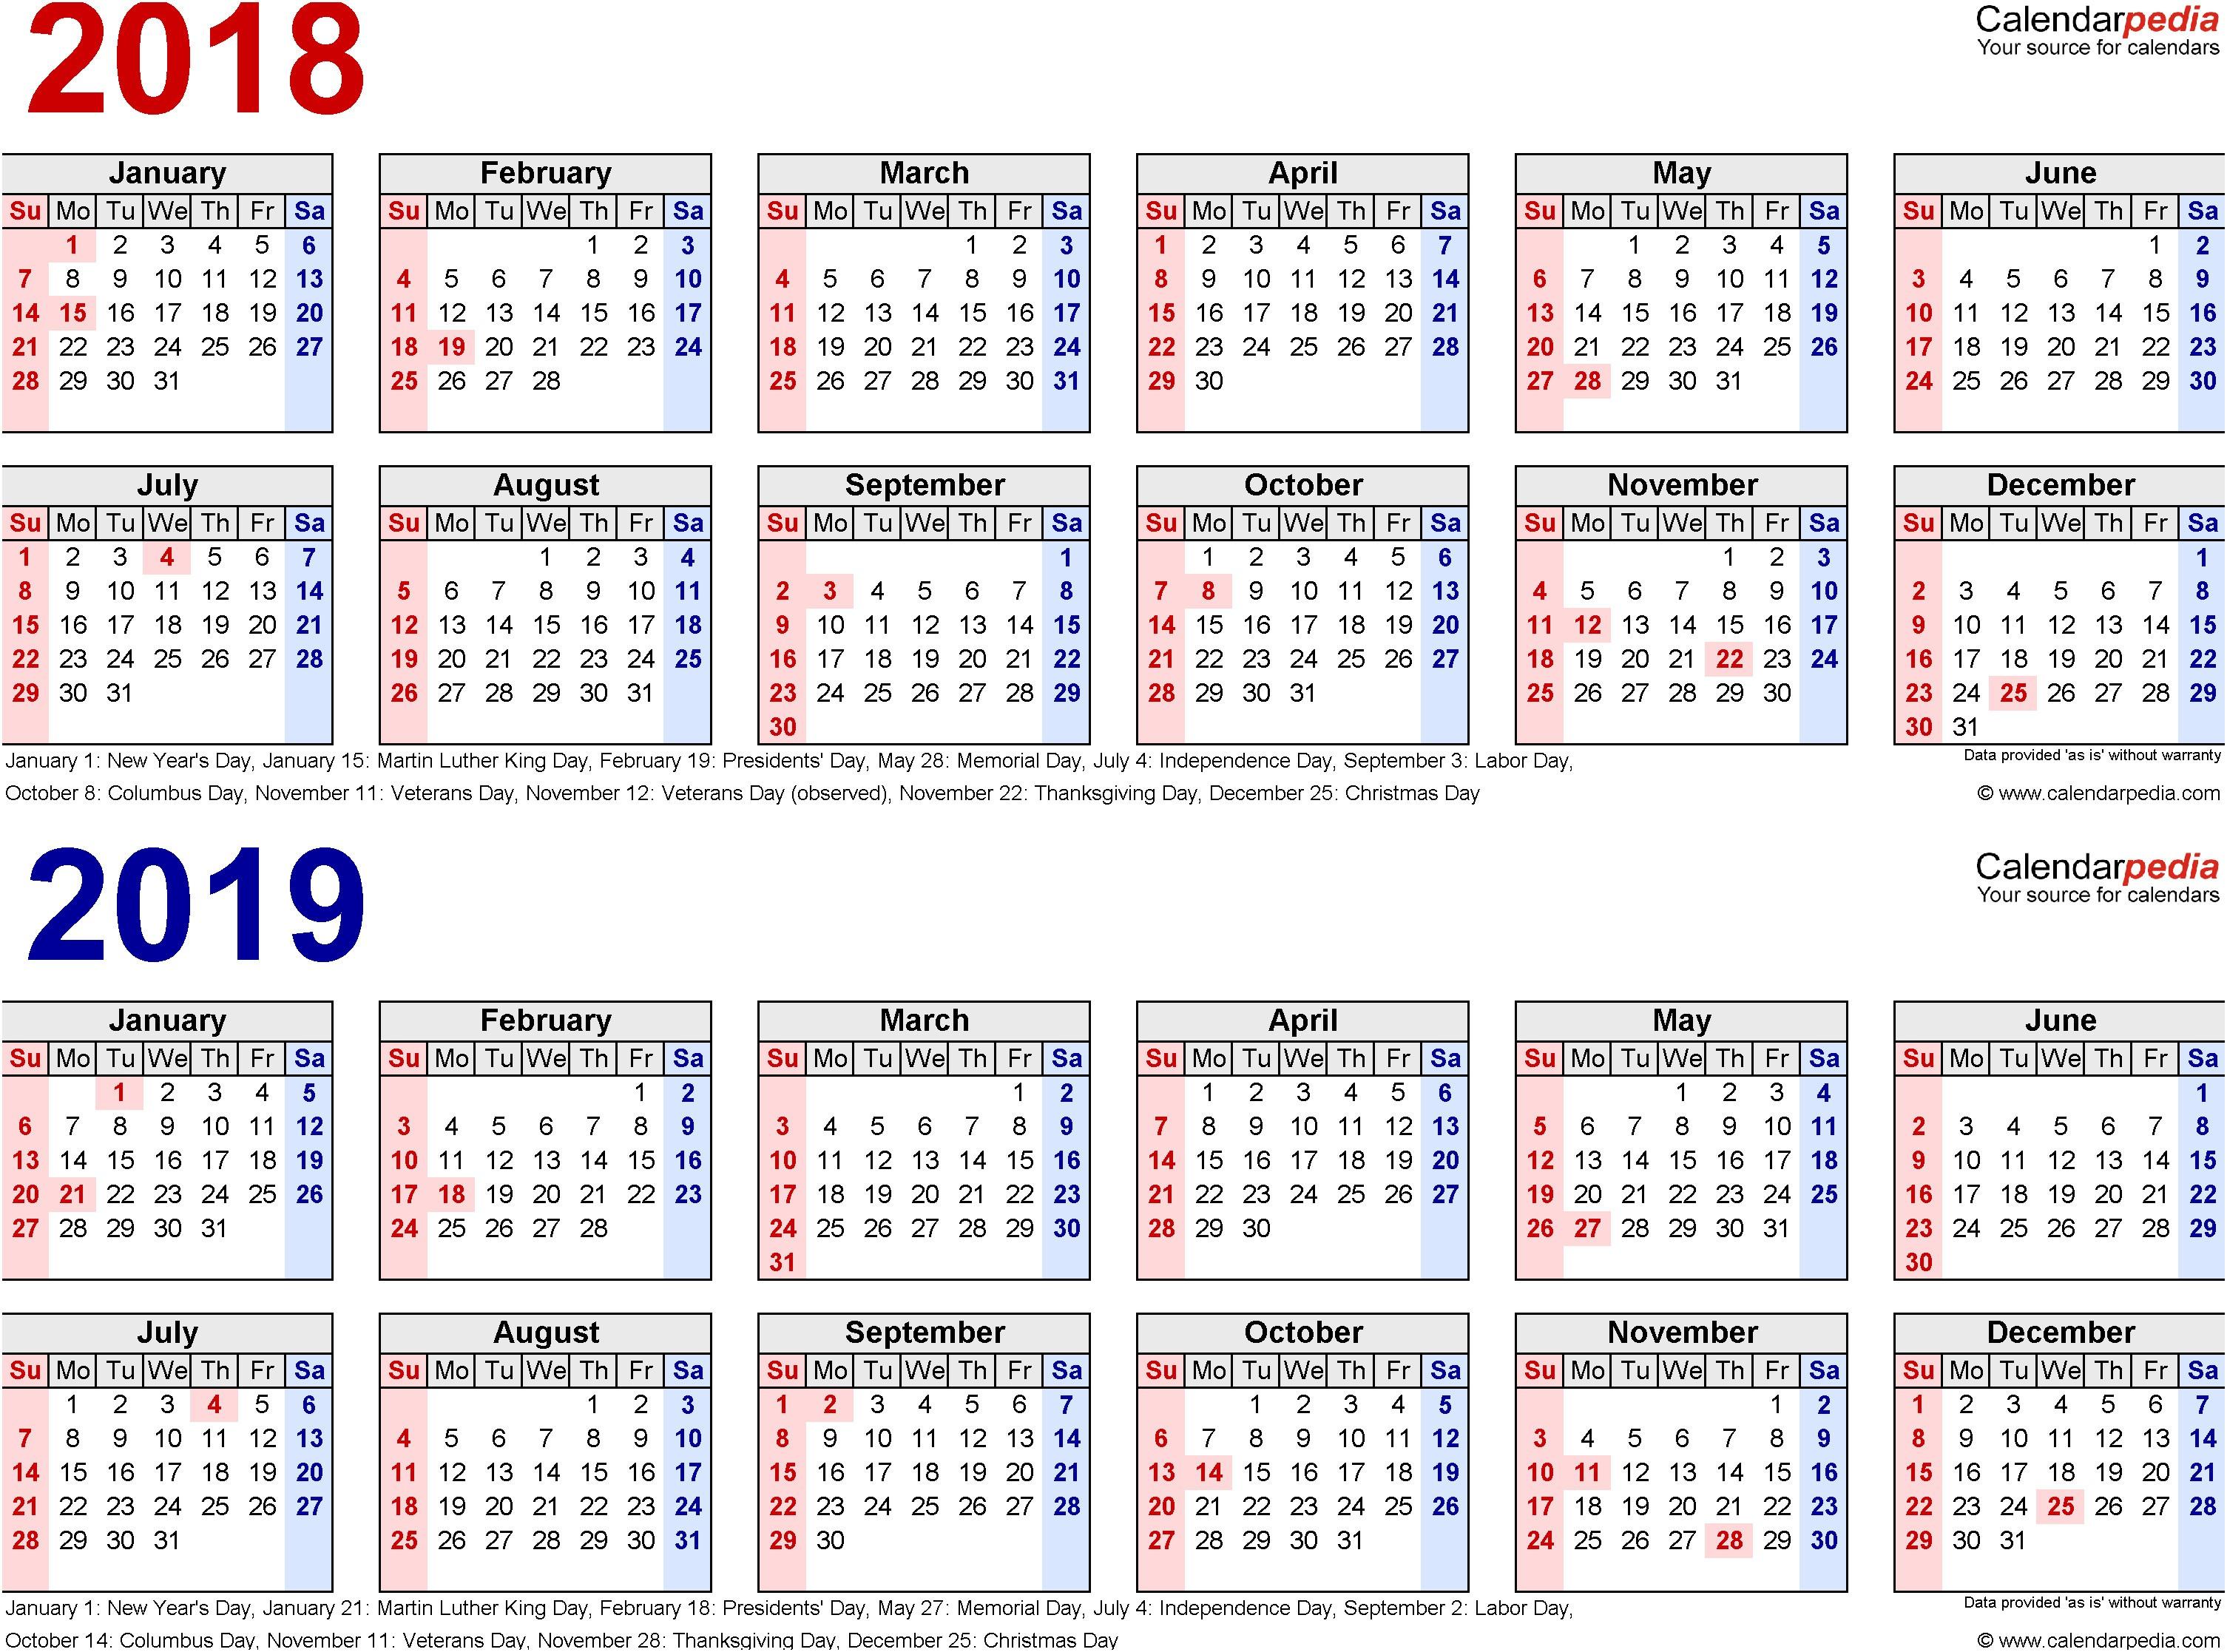 2017 Calendar Template Excel Image Result For Free Printable 2018 2019 Calendar